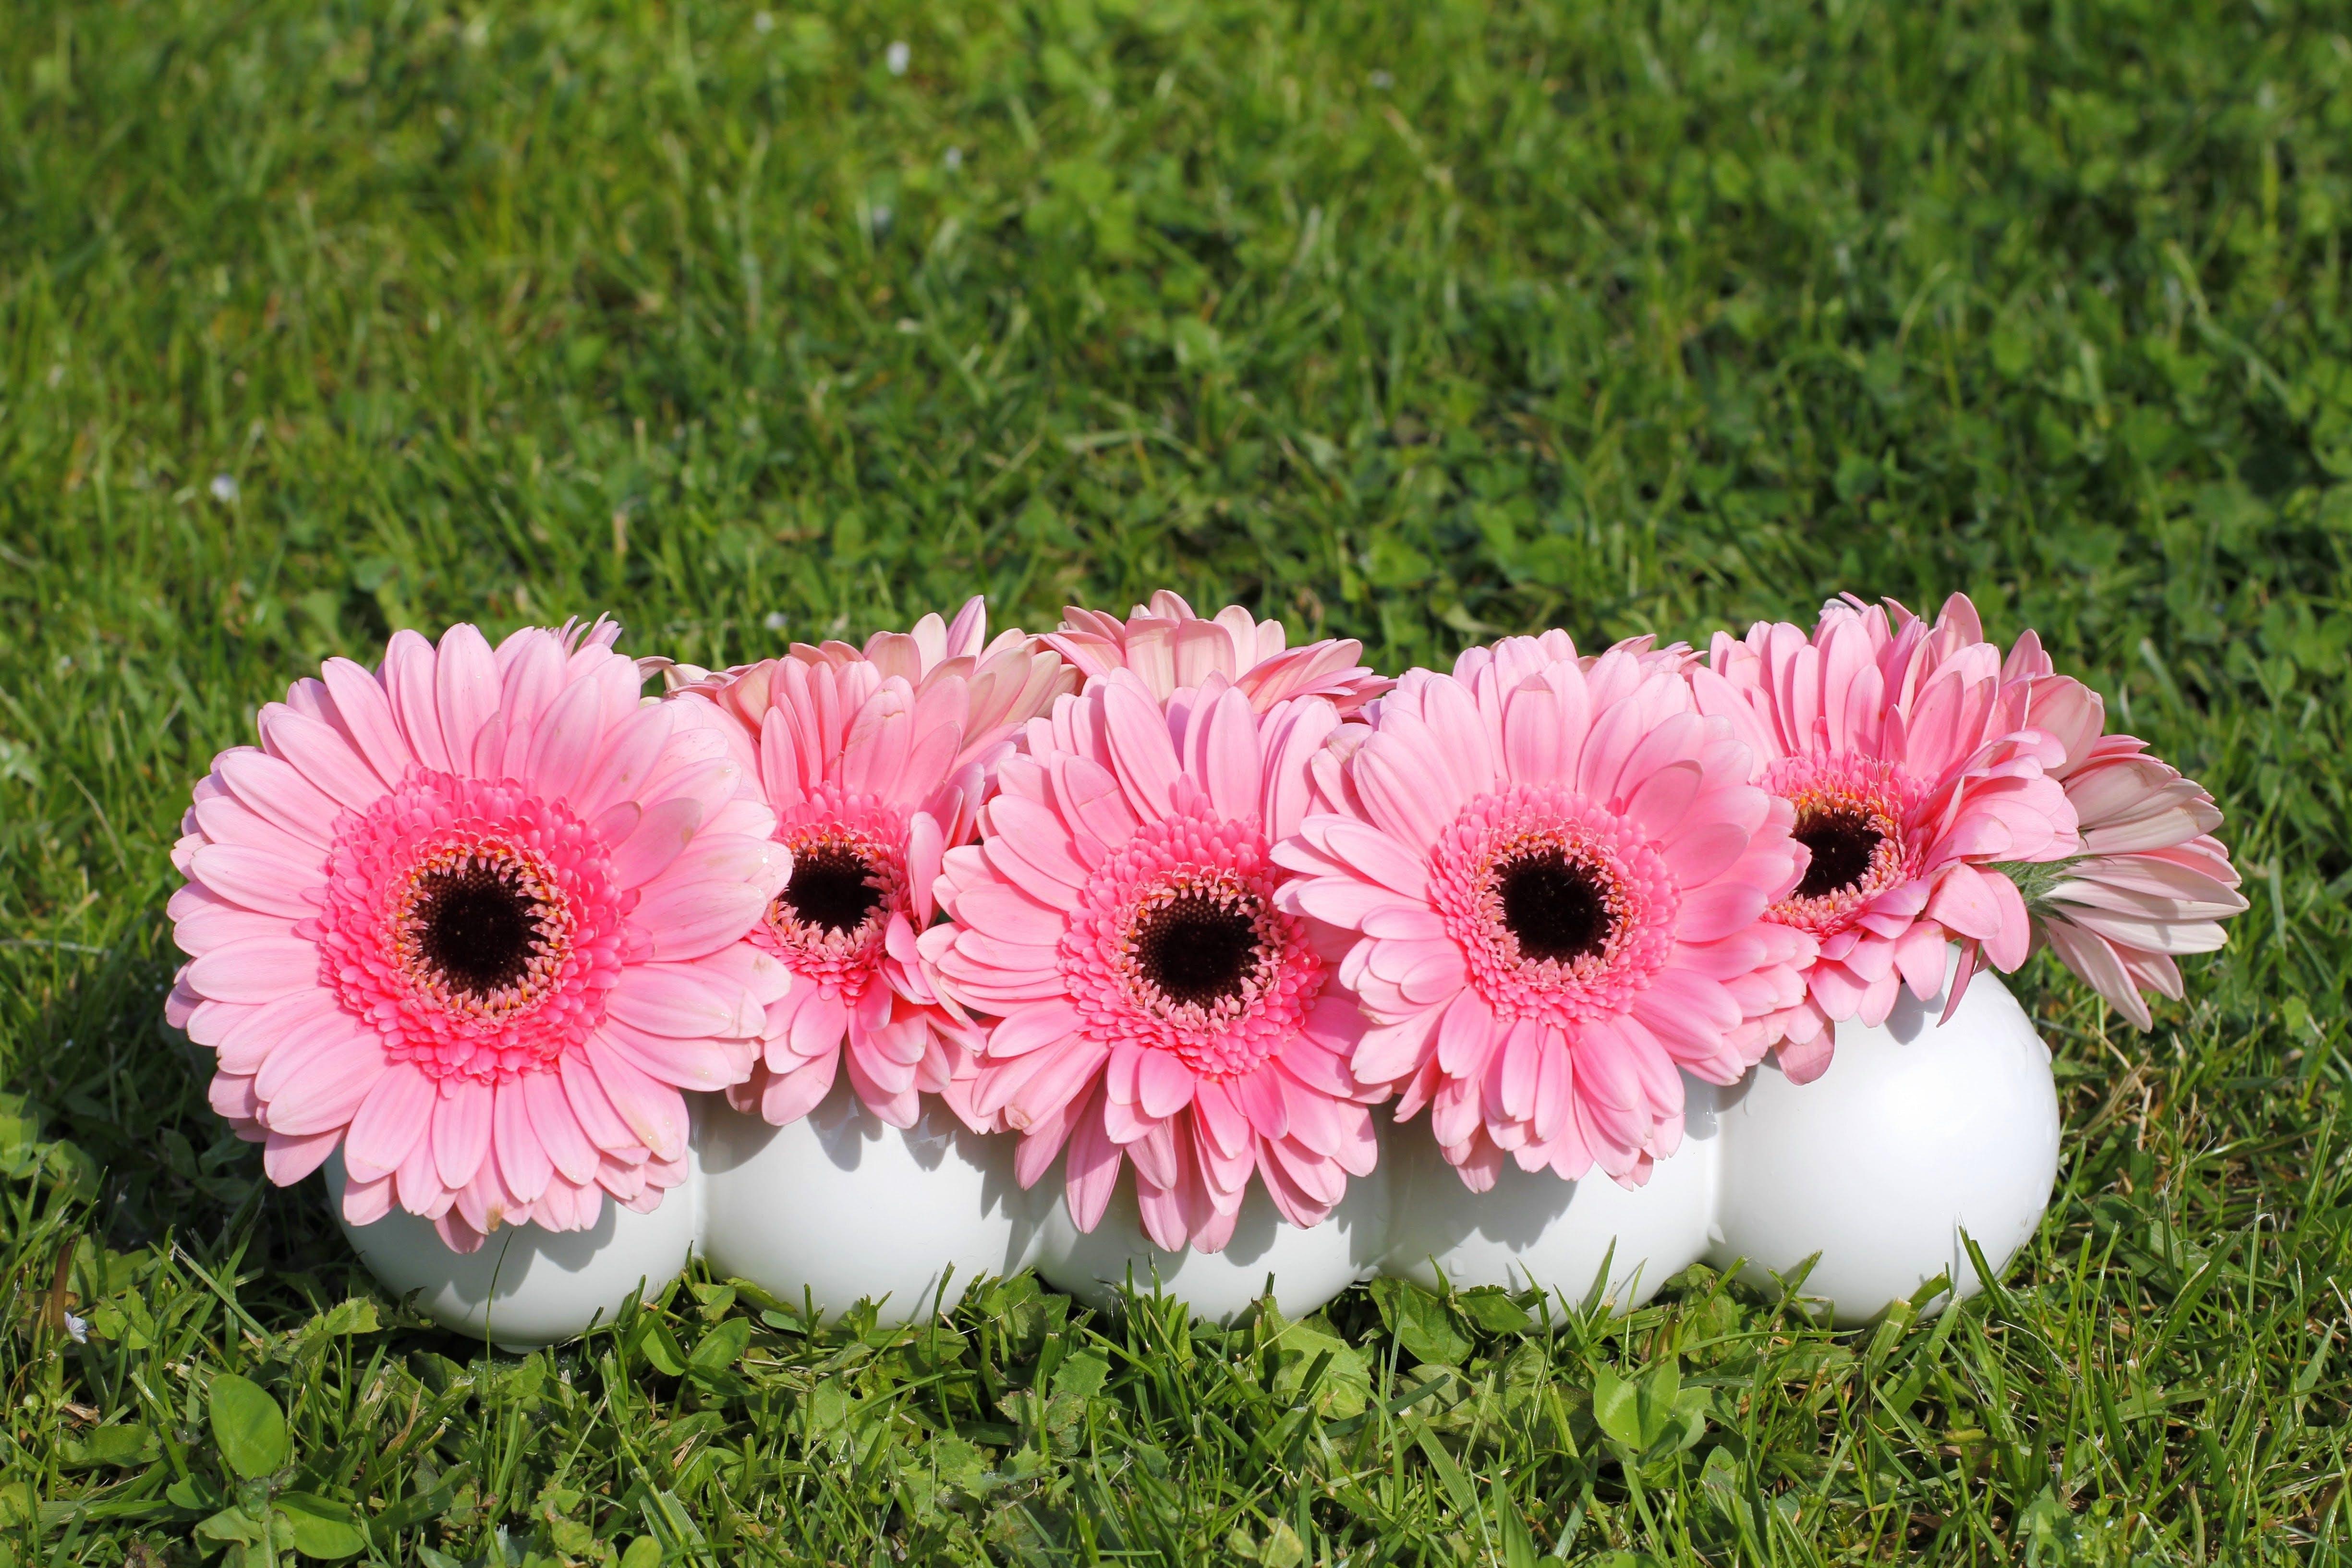 Fotos de stock gratuitas de césped, flora, floración, flores